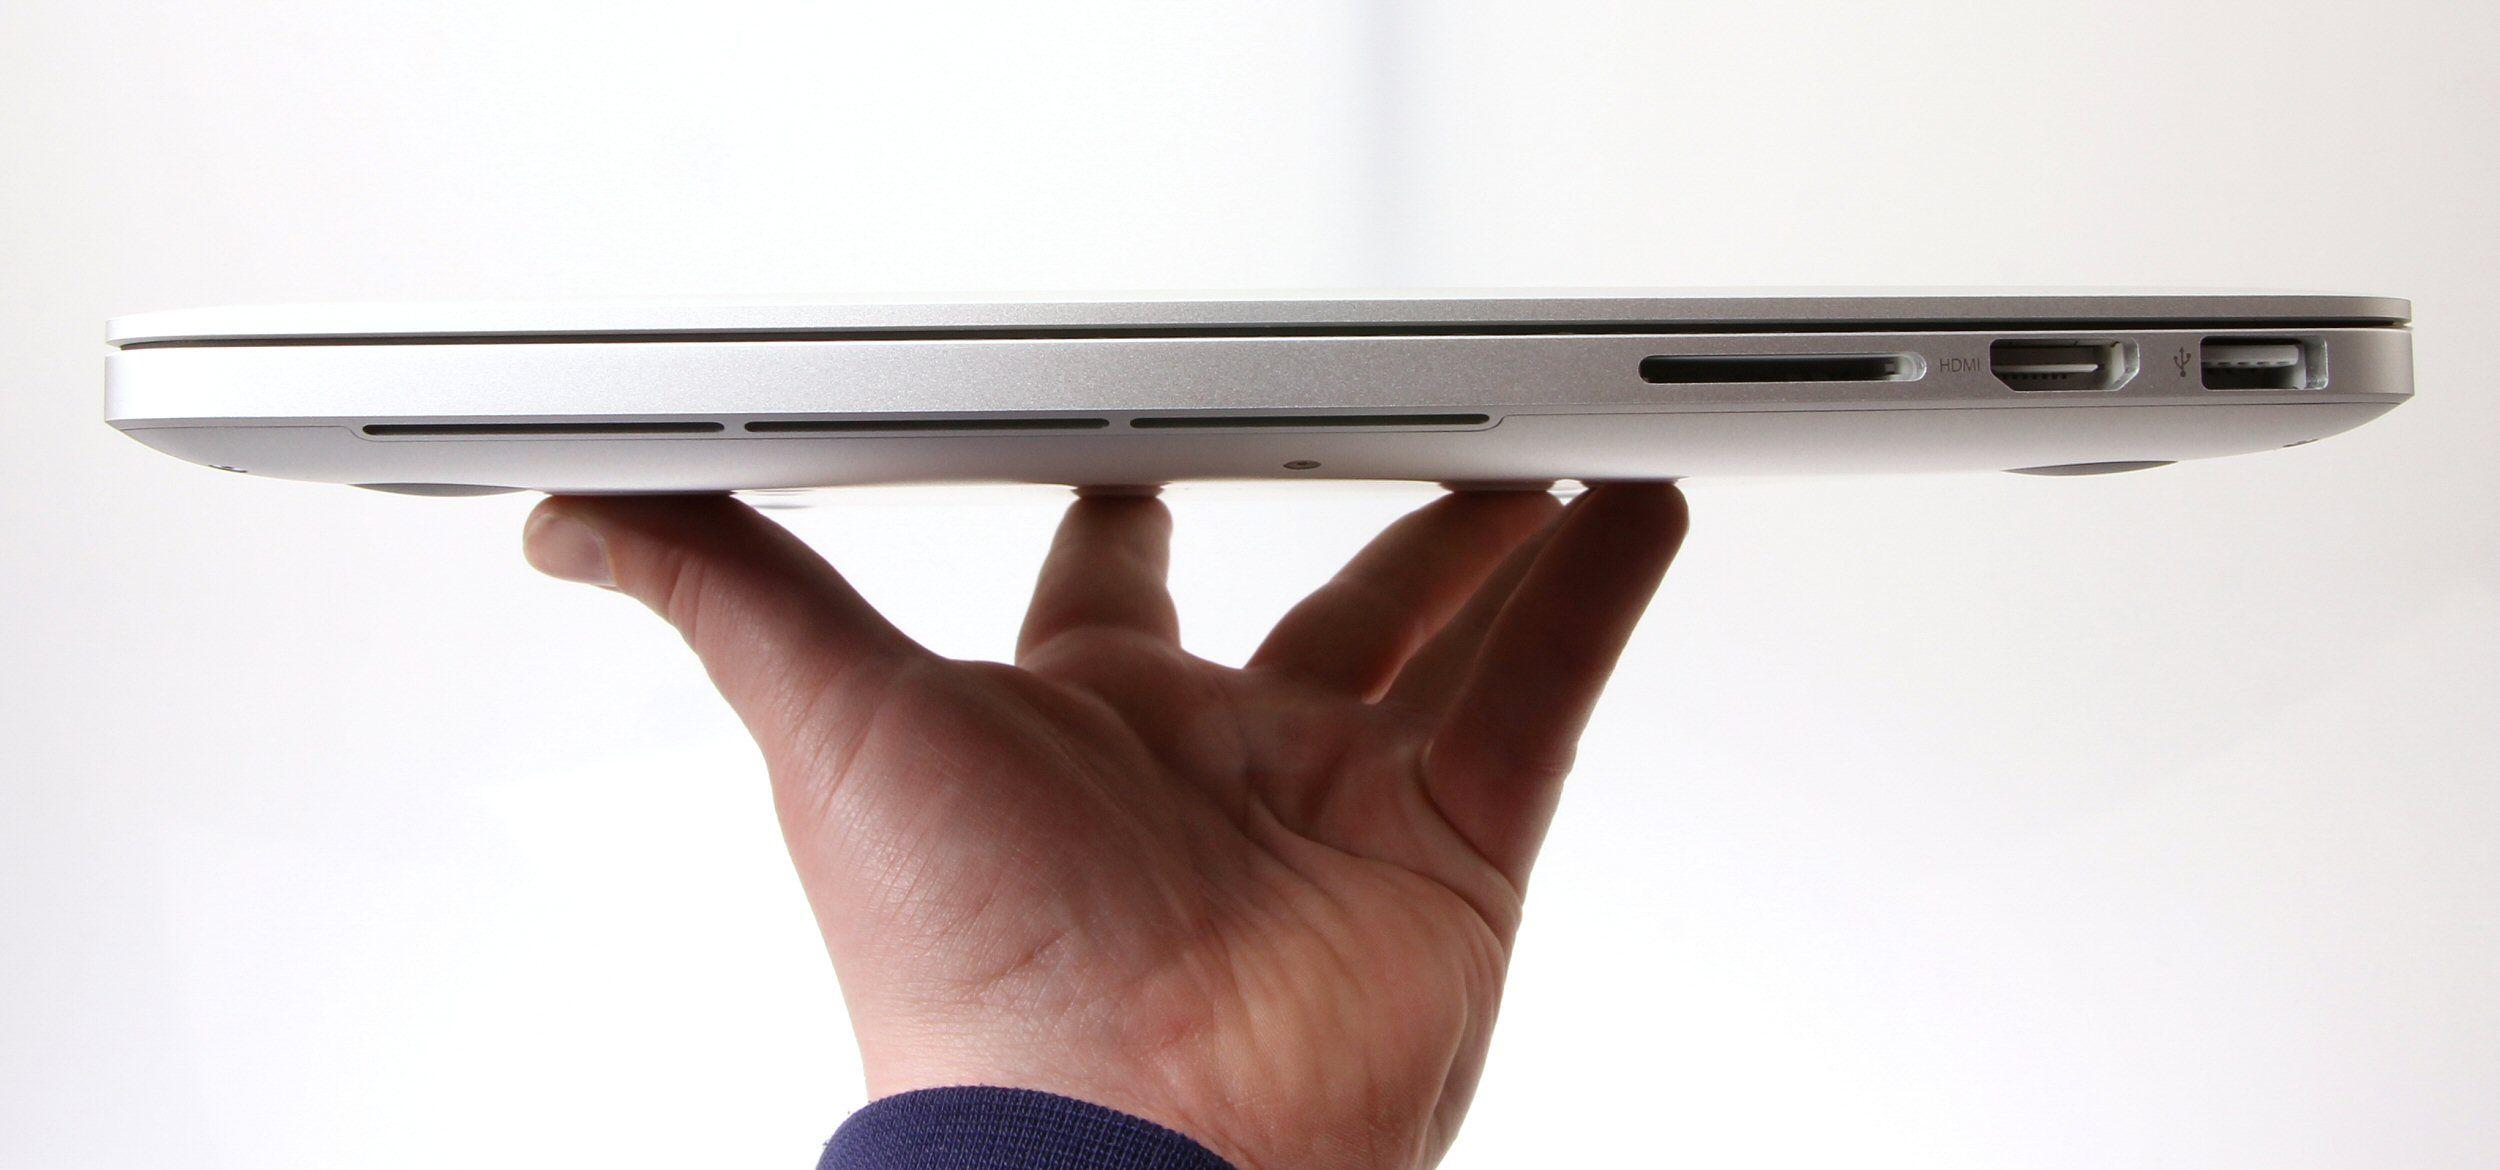 1,9 centimeter tykk, 1,63 kilogram tung.Foto: Vegar Jansen, Hardware.no